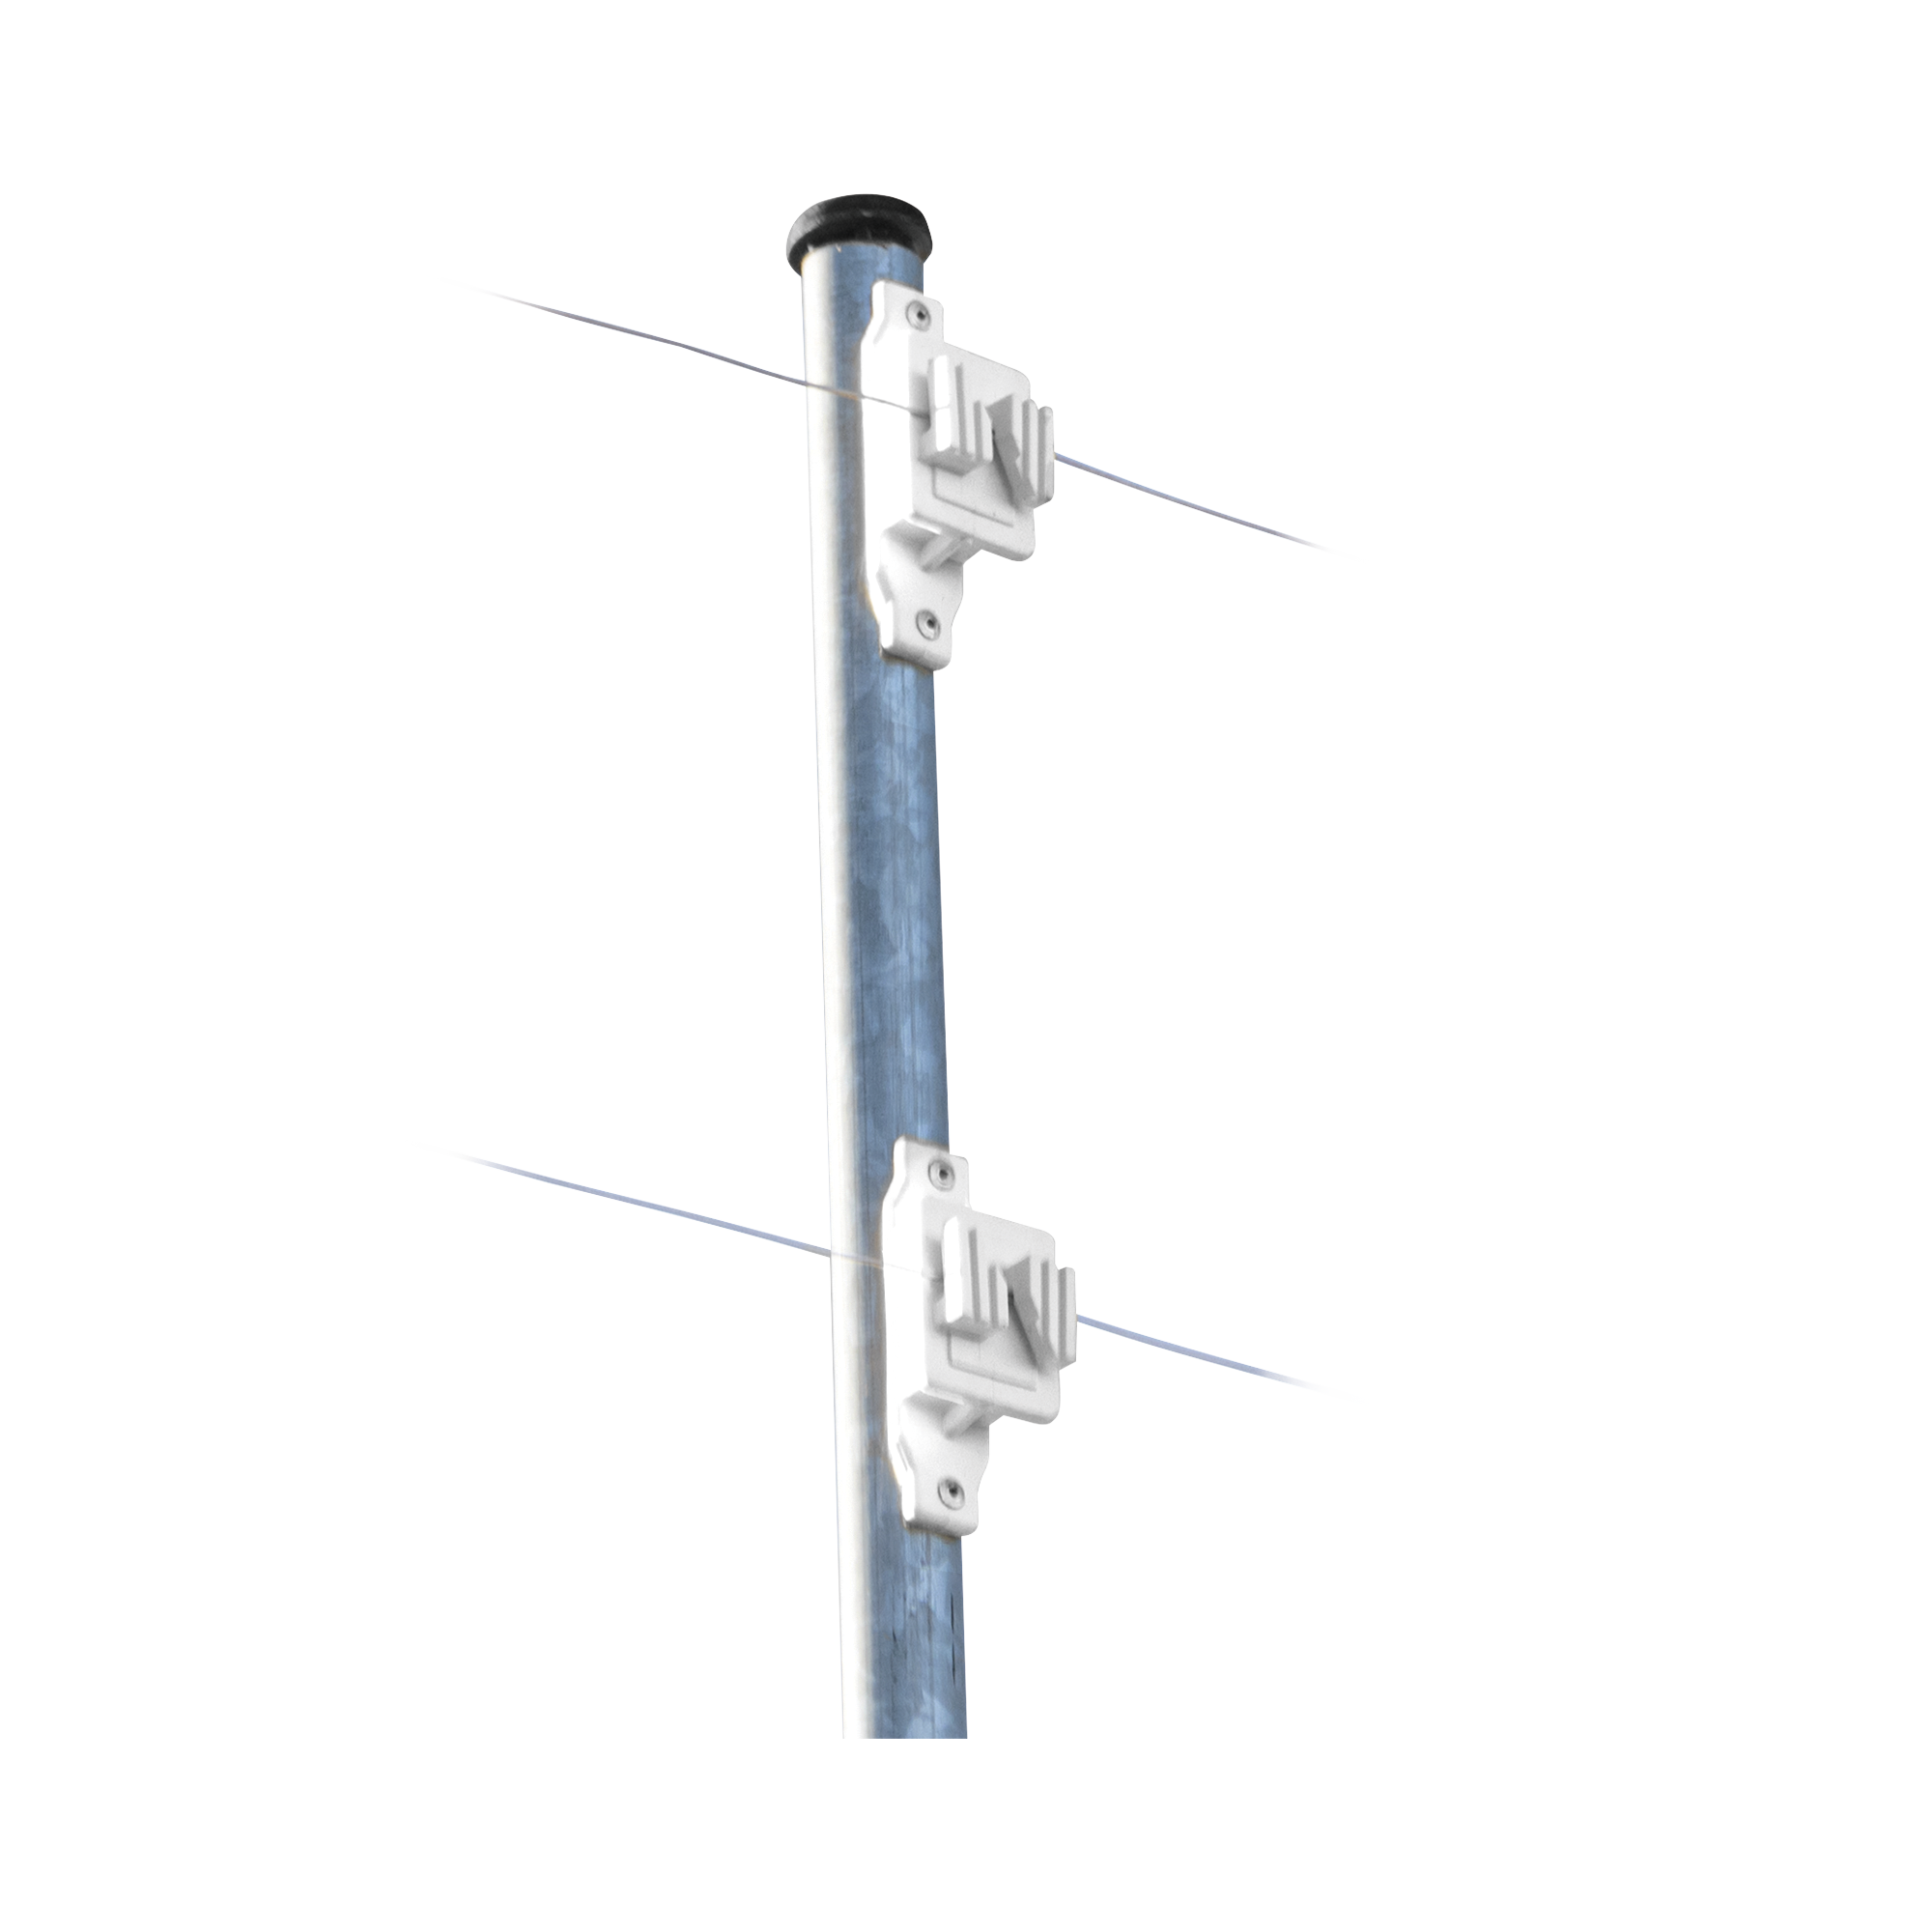 Aislador de Paso Blanco reforzado para cercos eléctricos, resistente al clima extremoso